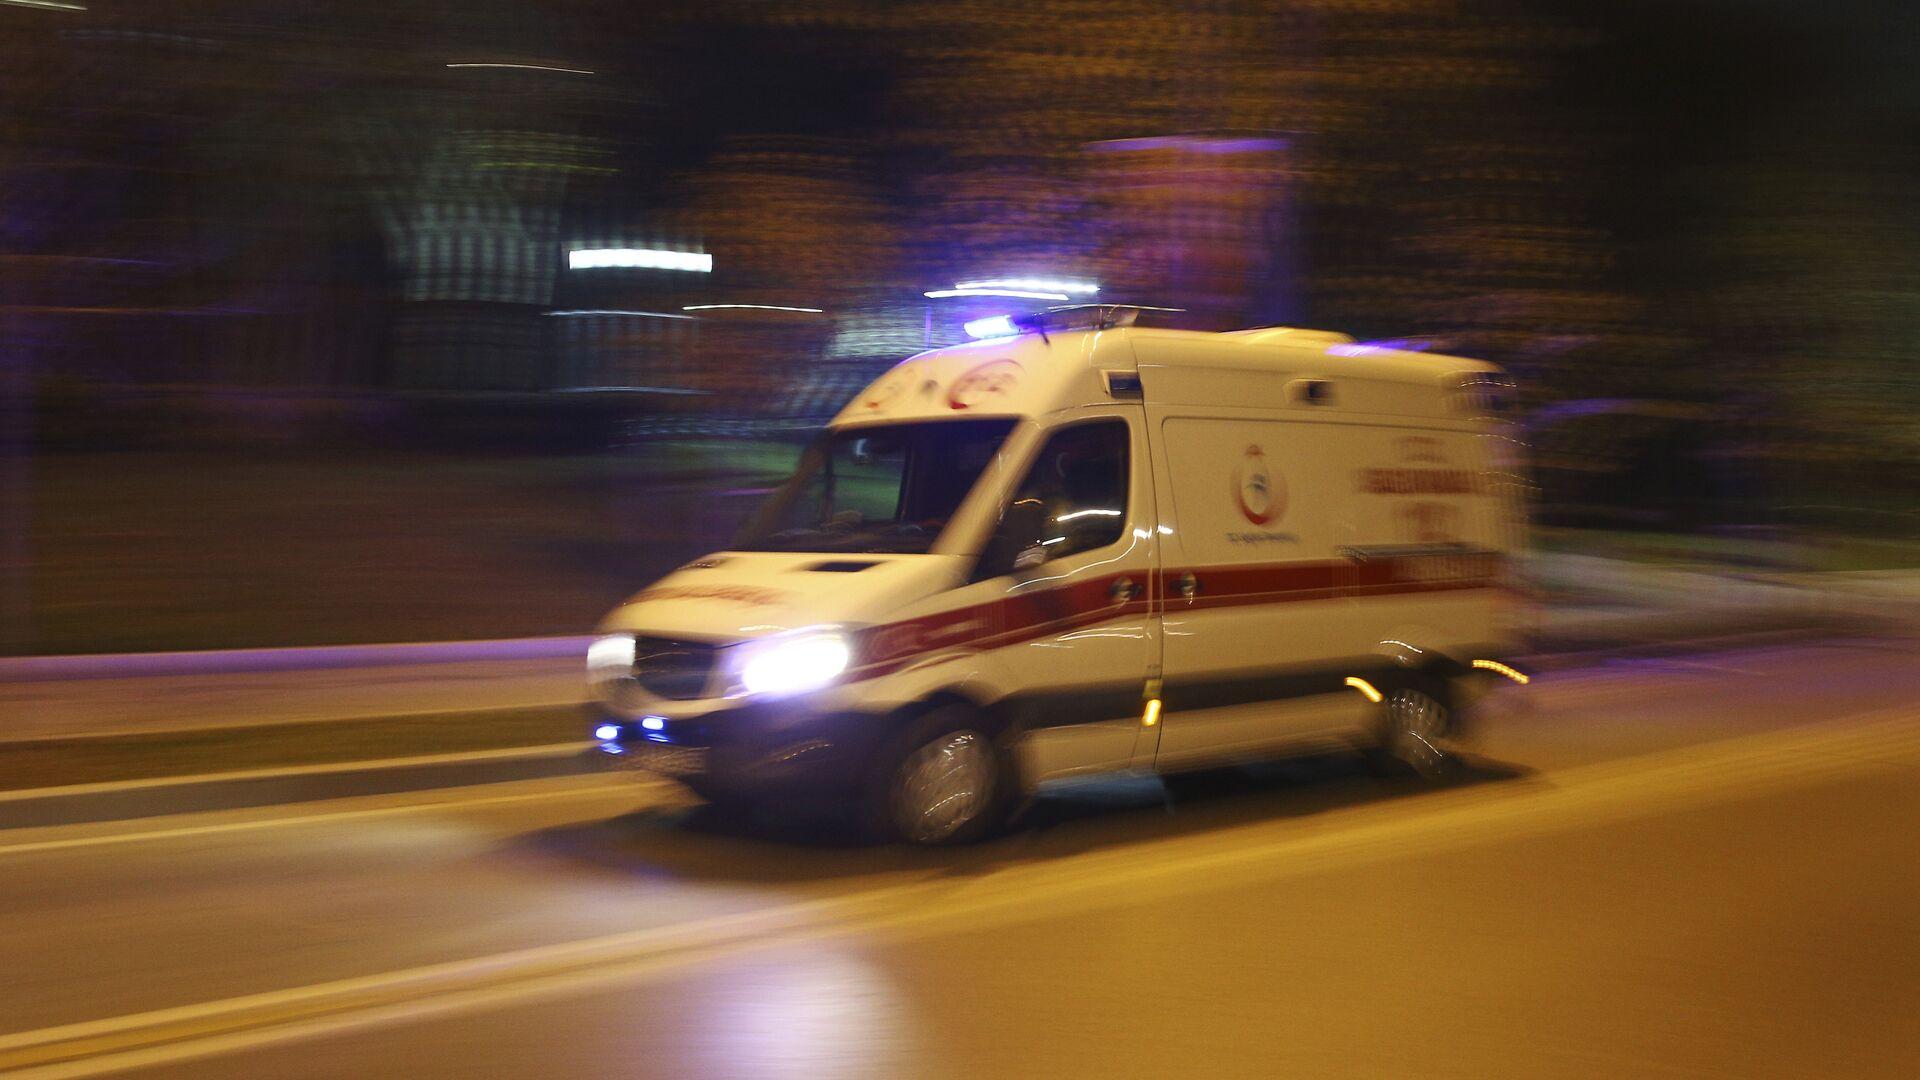 Turkey ambulance. (File) - Sputnik International, 1920, 02.08.2021